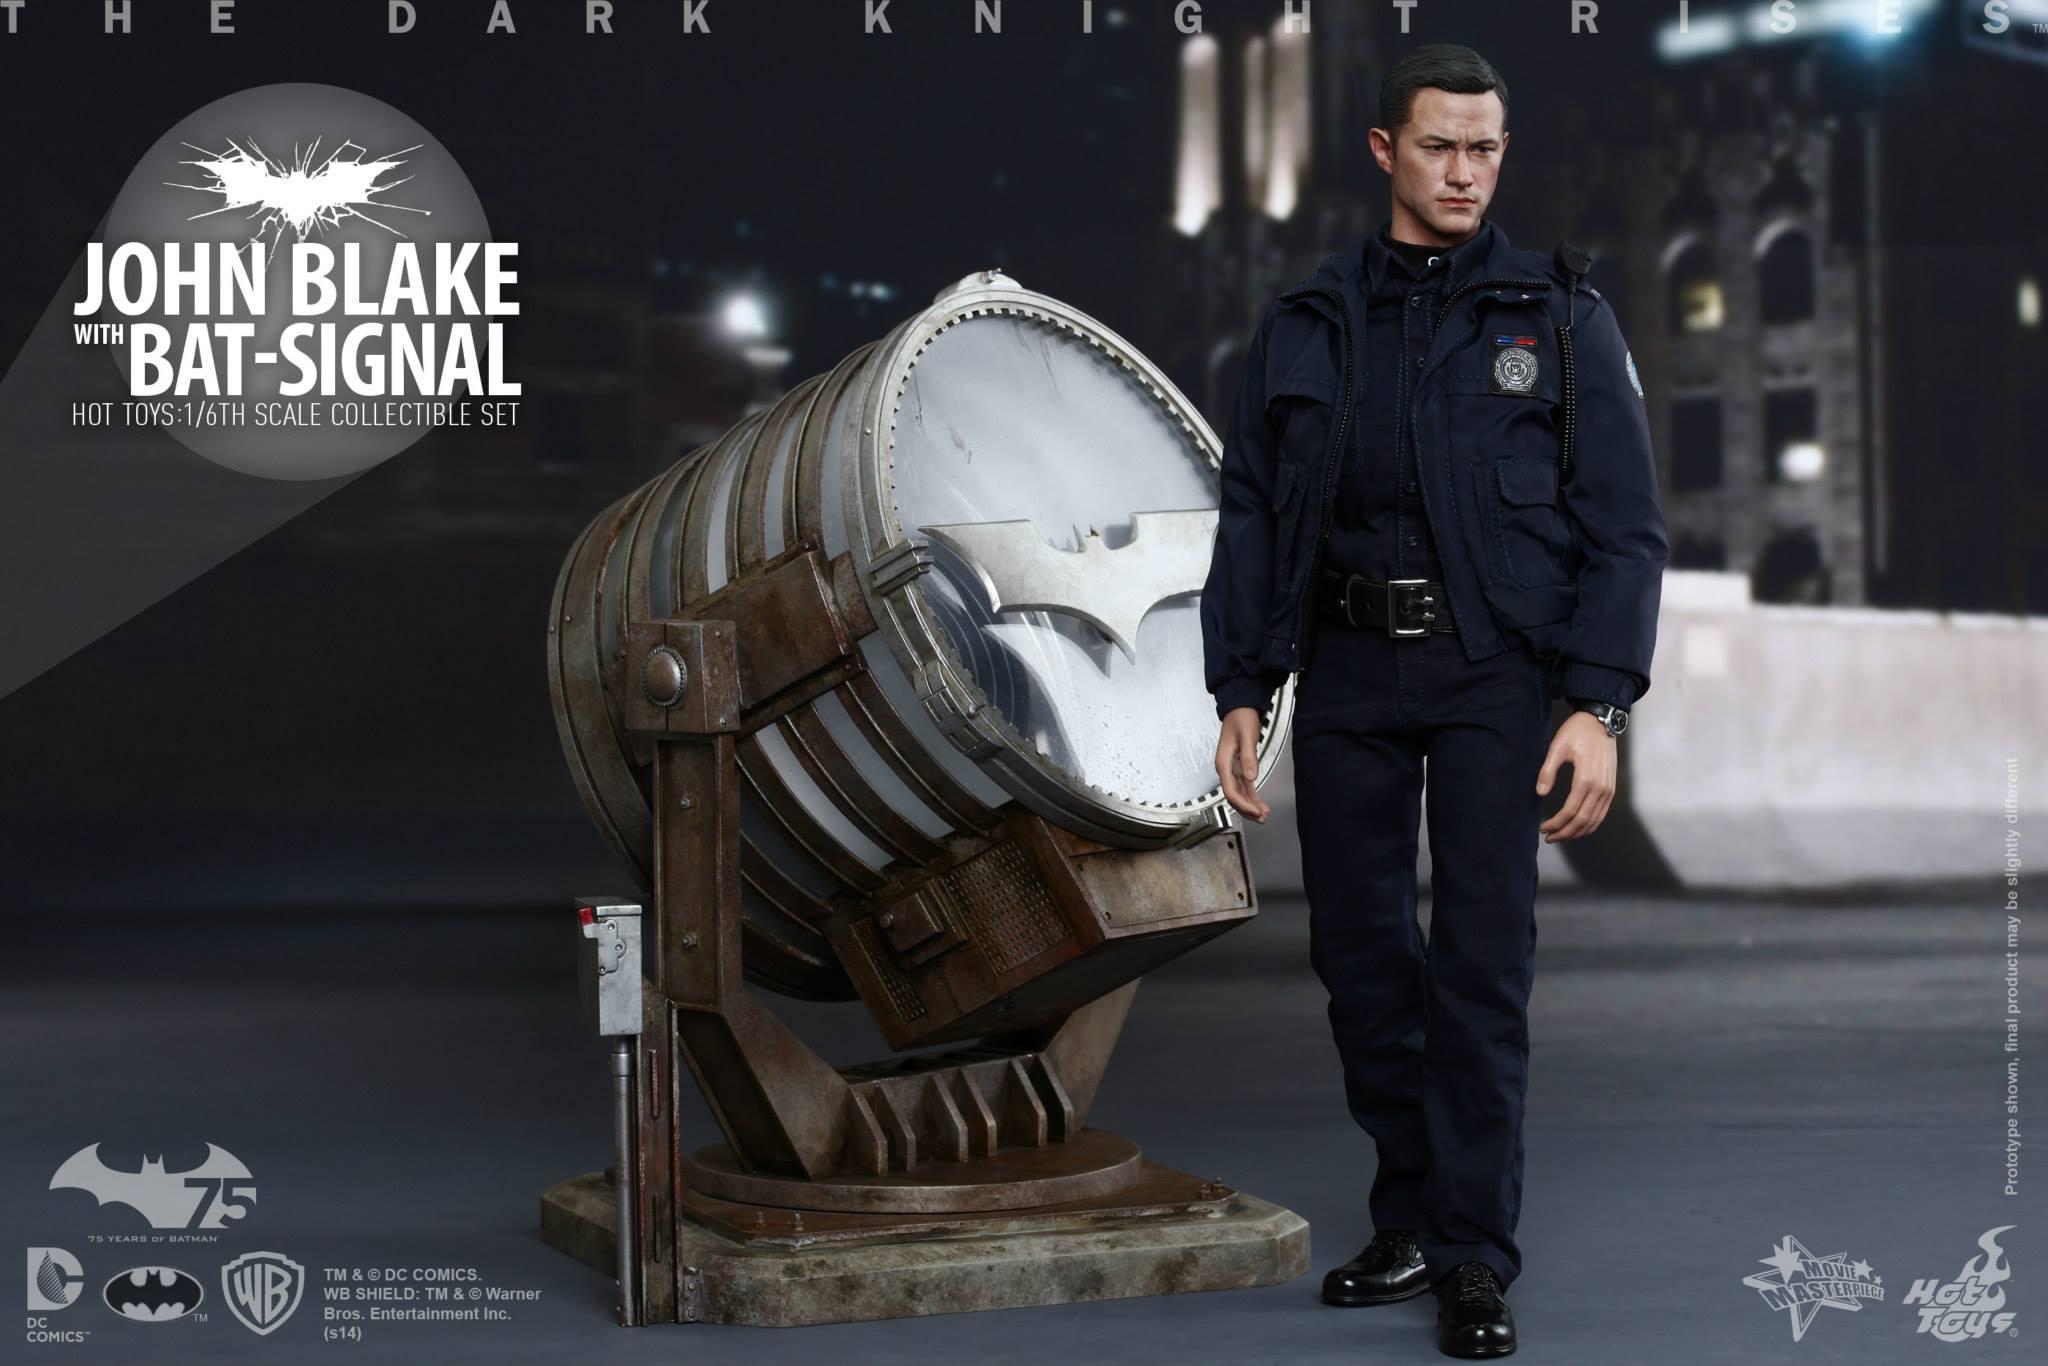 THE DARK KNIGHT RISES - Lt. JIM GORDON & JOHN BLAKE w/BATSIGNAL 540039101